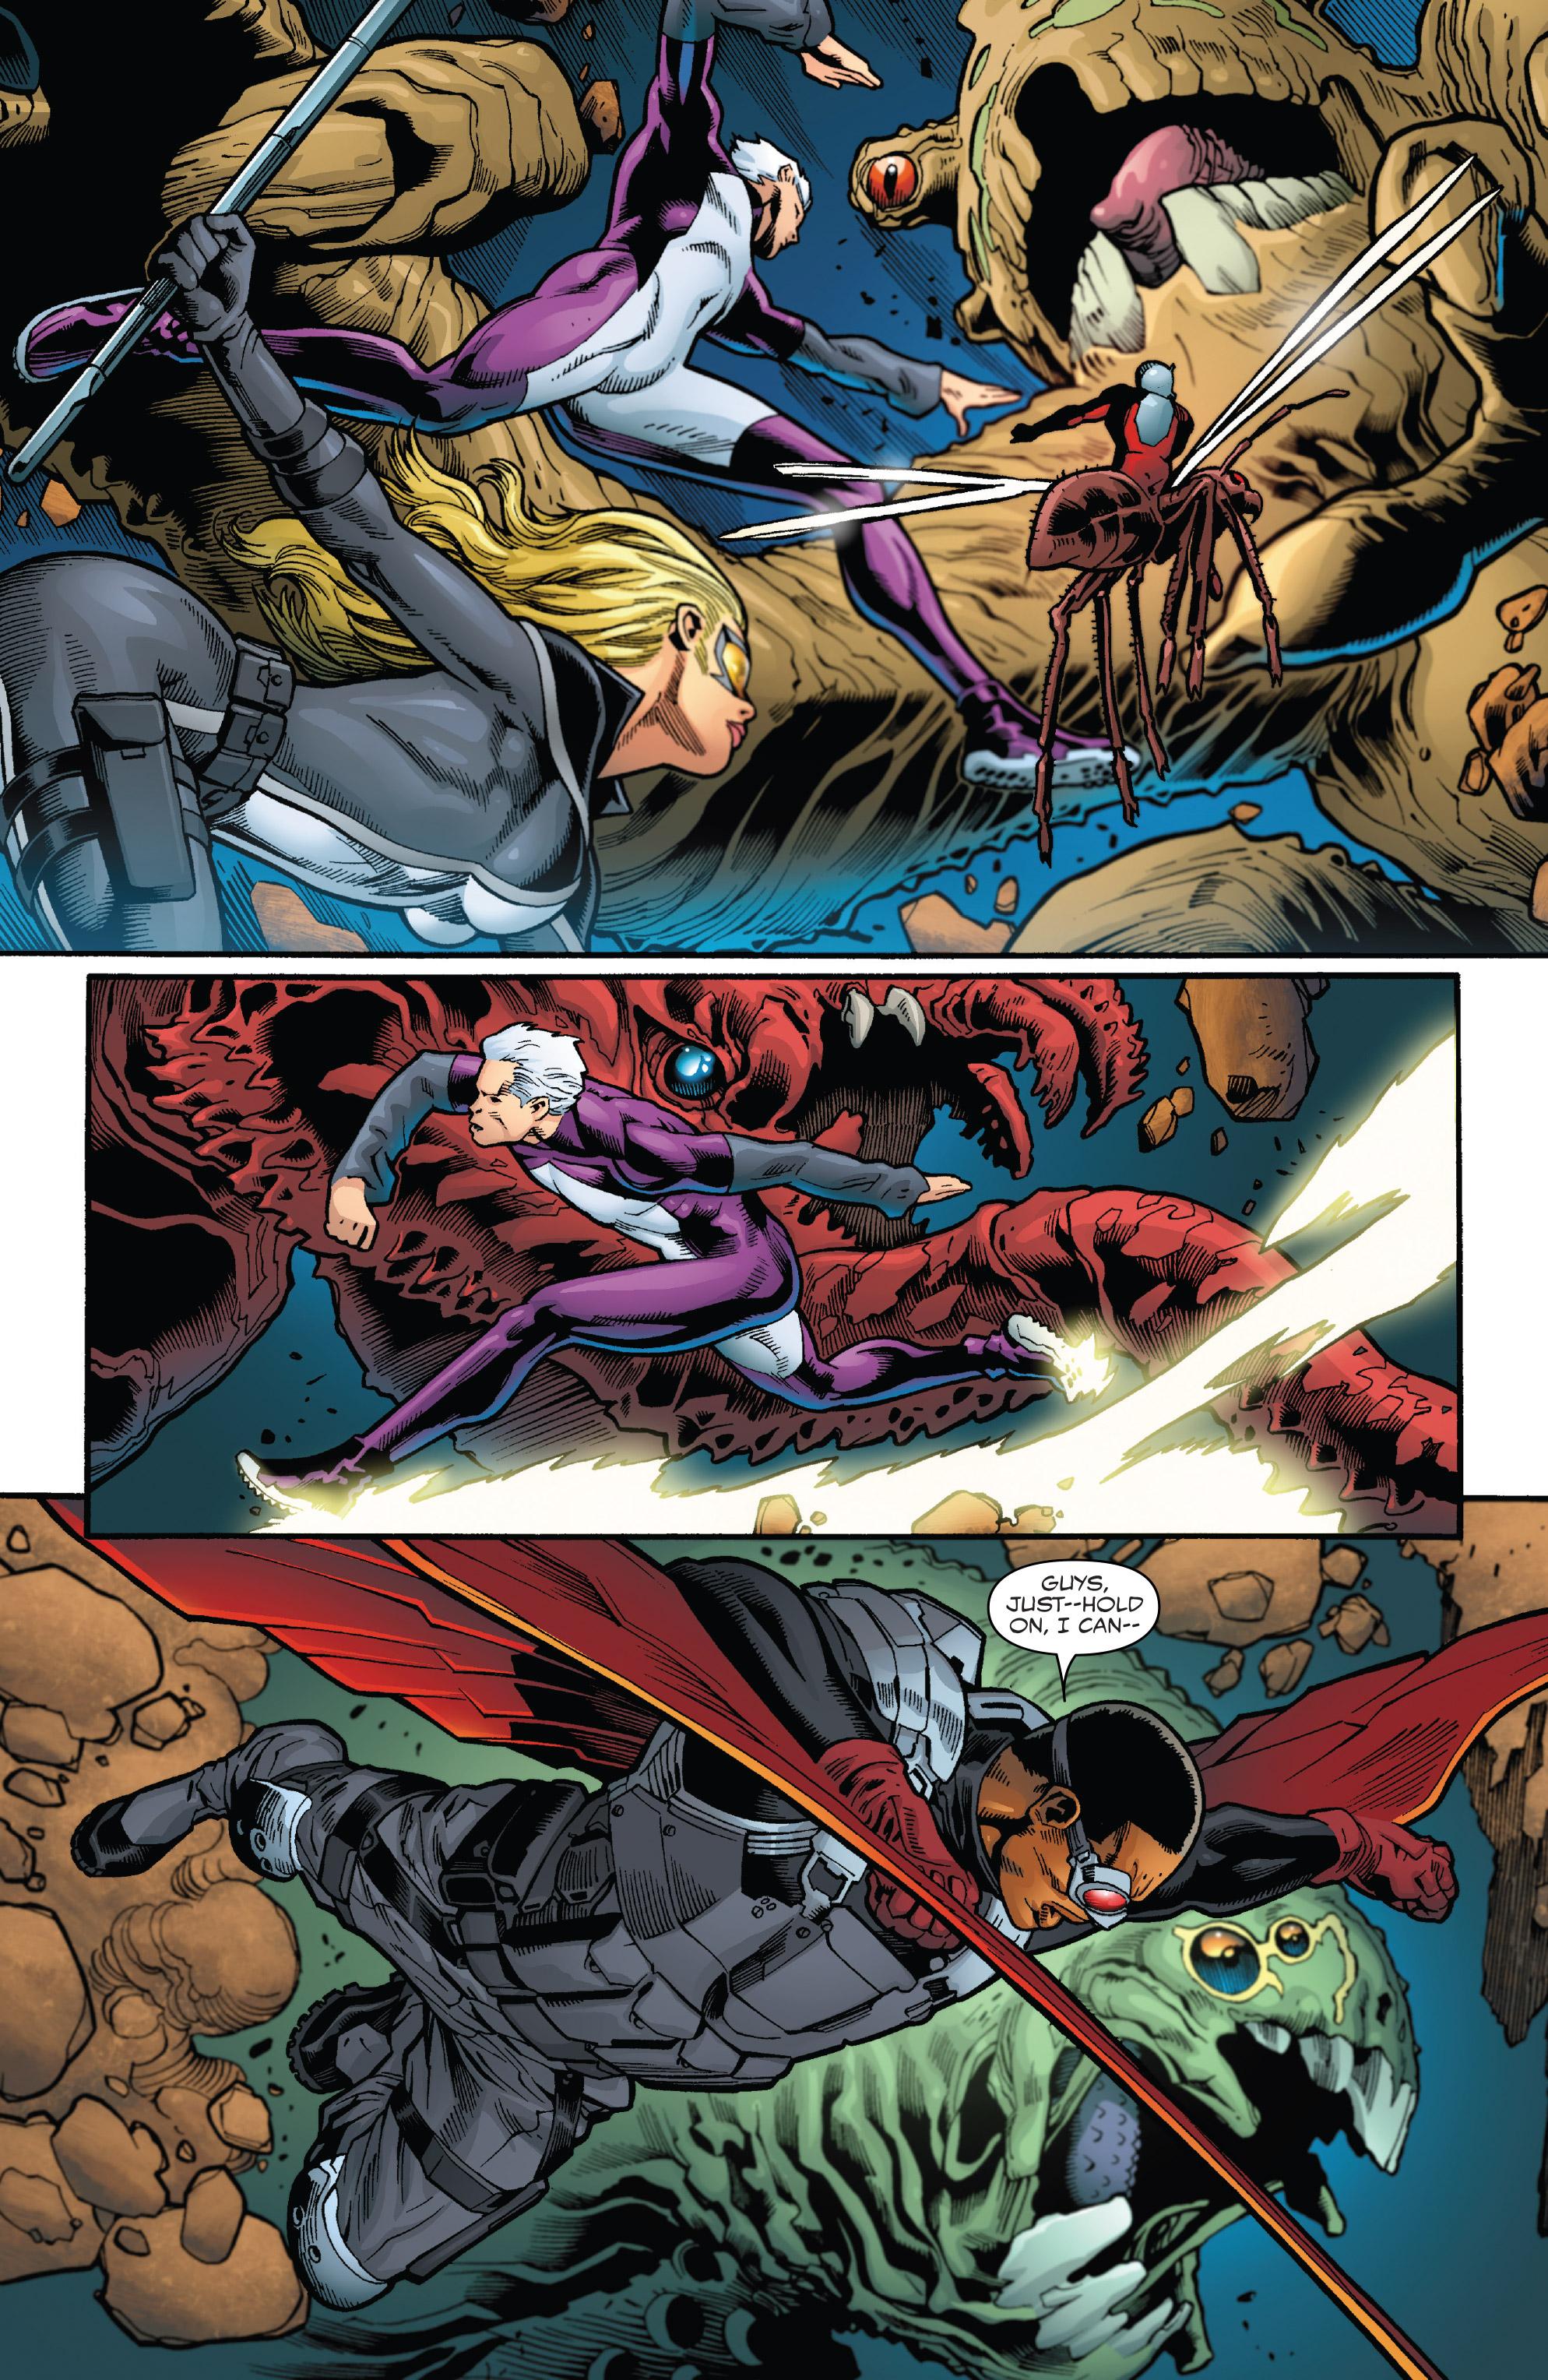 Read online Captain America: Sam Wilson comic -  Issue #23 - 11